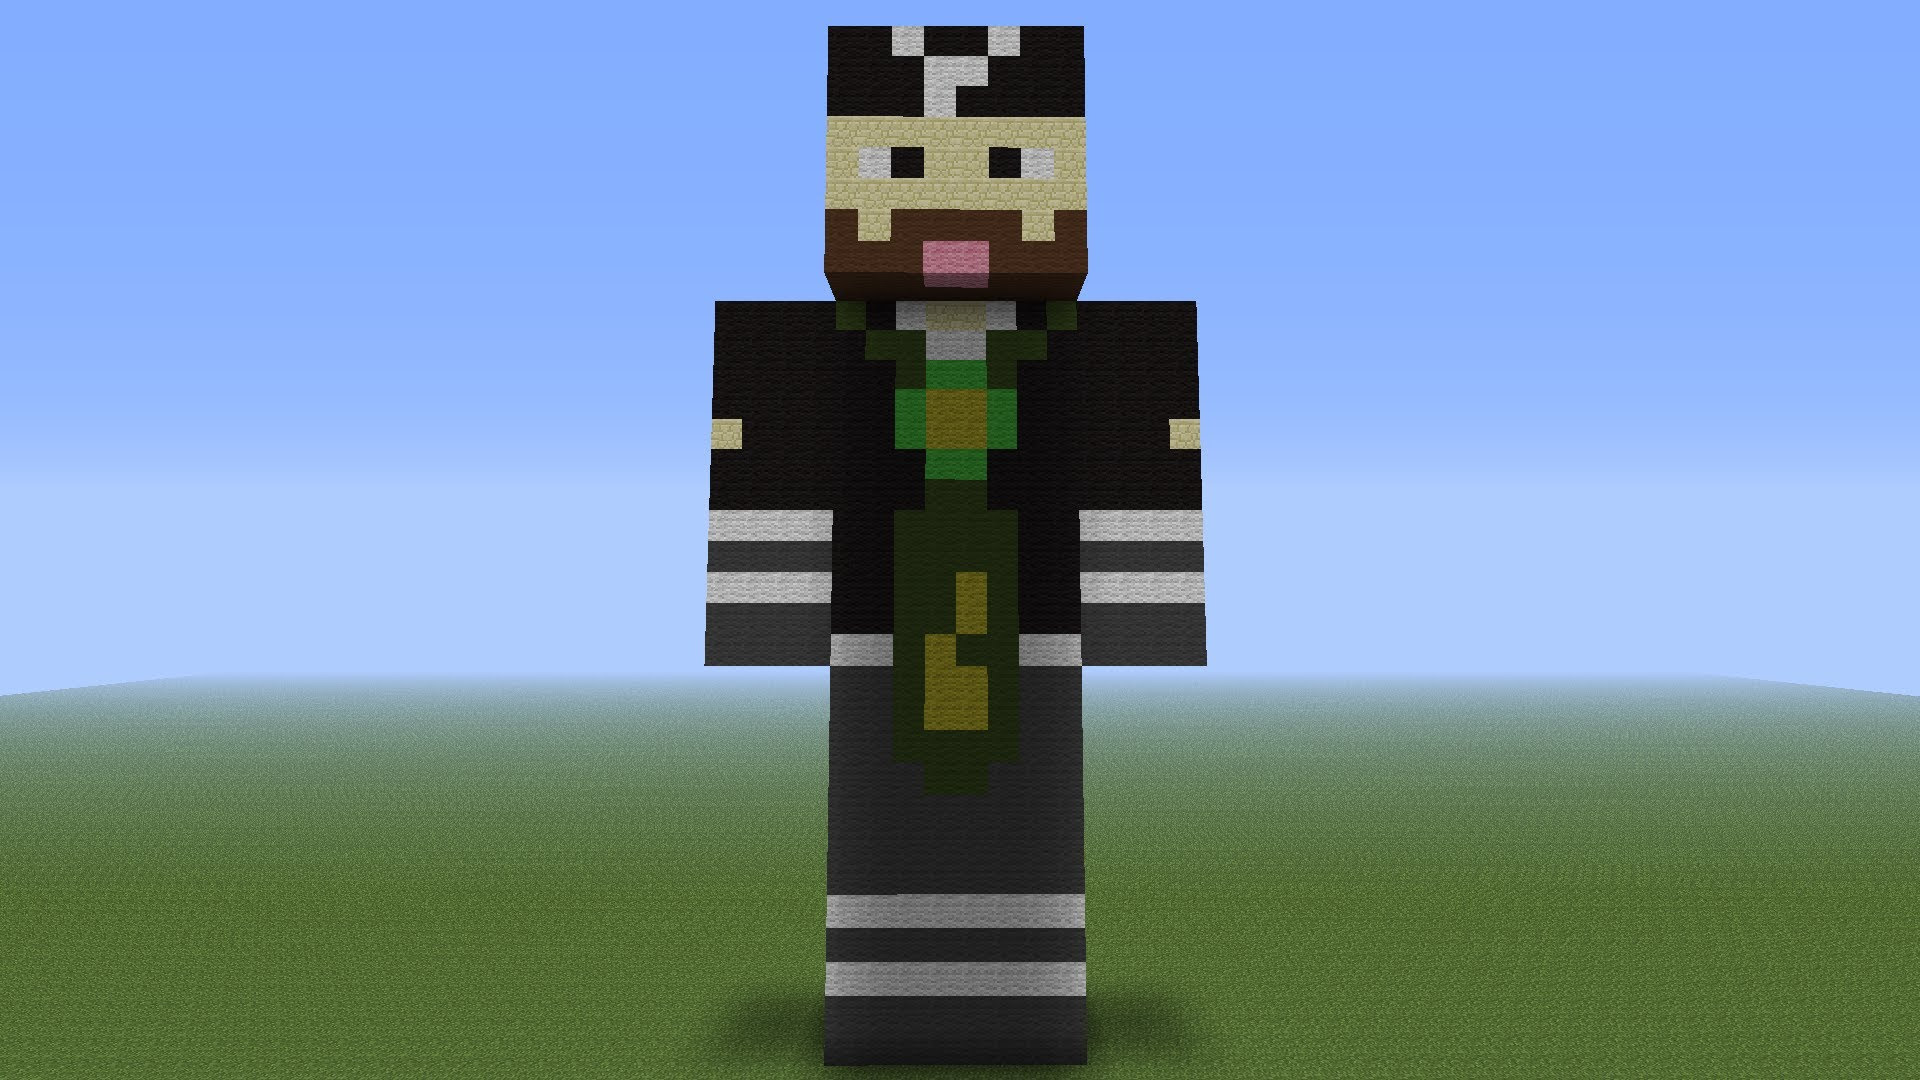 Minecraft Skin Download Pc Free - Nyepi p